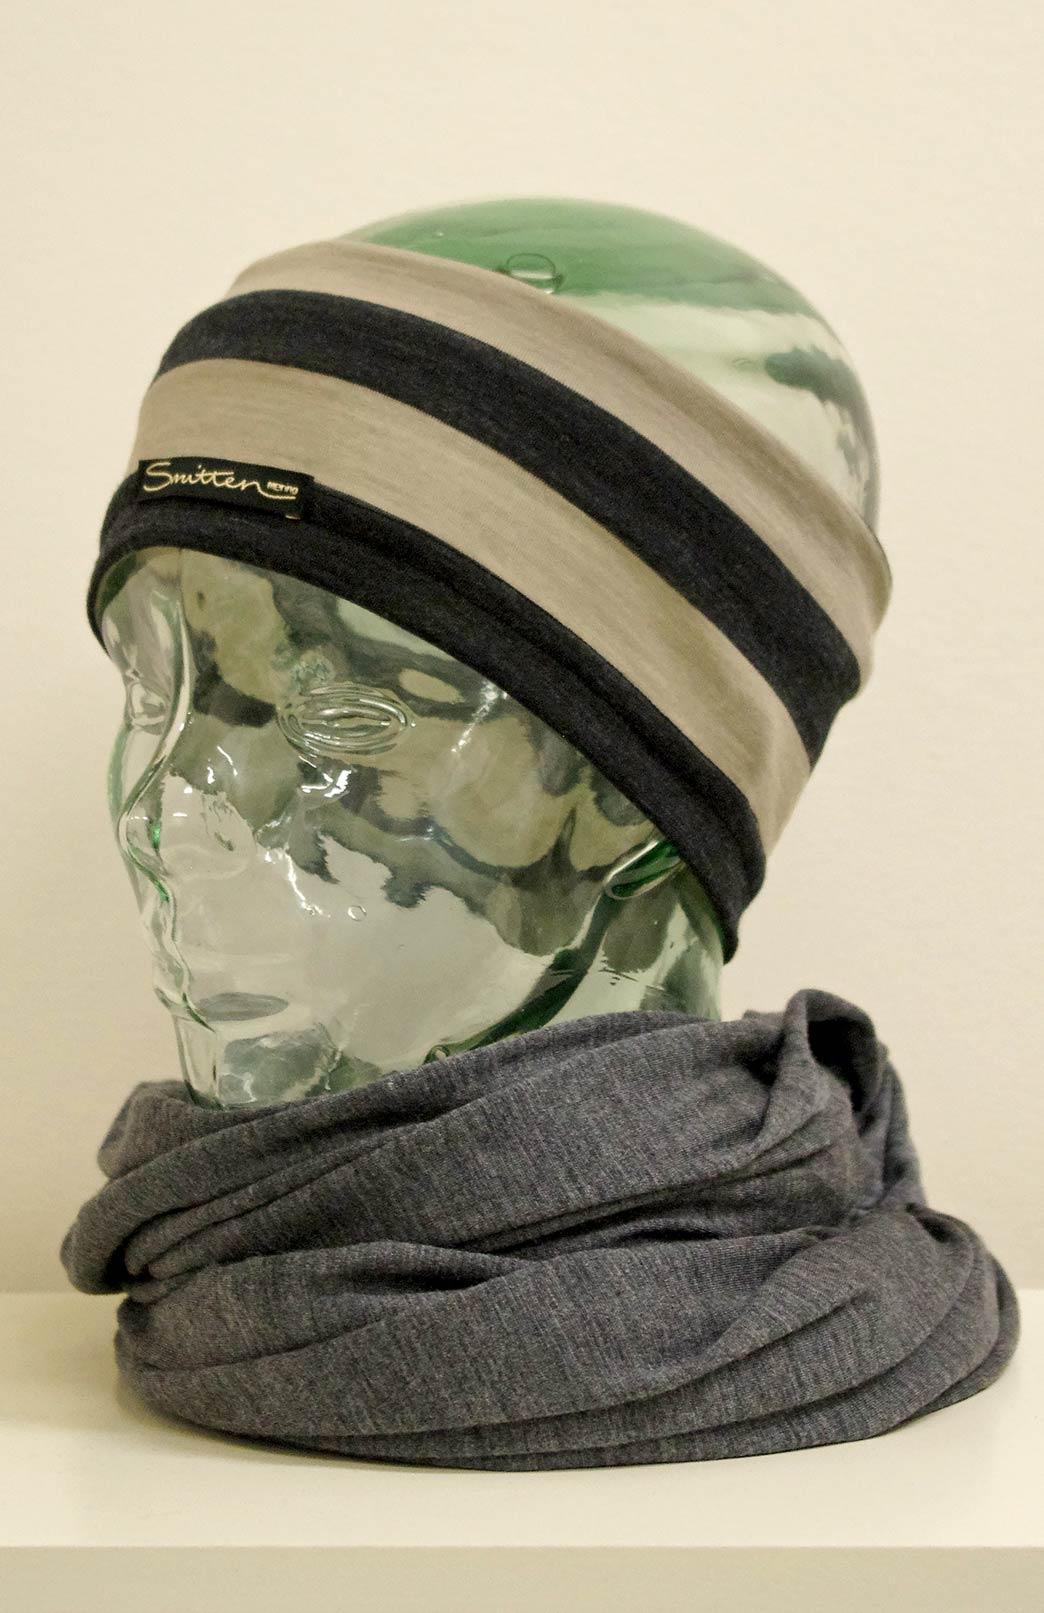 Headband / Ear Warmer - Unisex Taupe Charcoal Stripe Merino Wool Headband and Ear Warmer - Smitten Merino Tasmania Australia